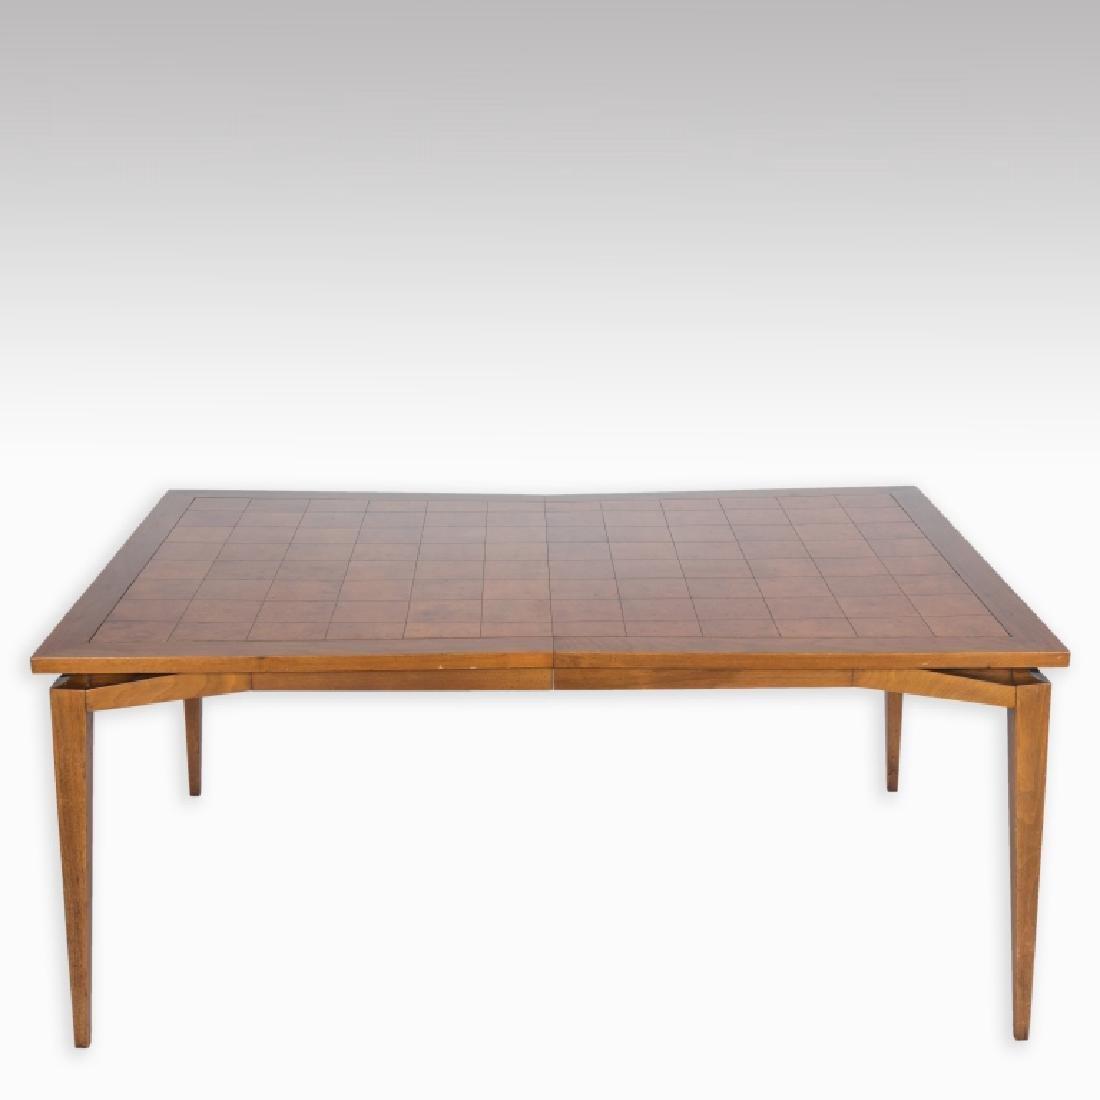 Tomlinson Walnut Burled Dining Room Table Mar 25 2017 Regency Auction House In Nj